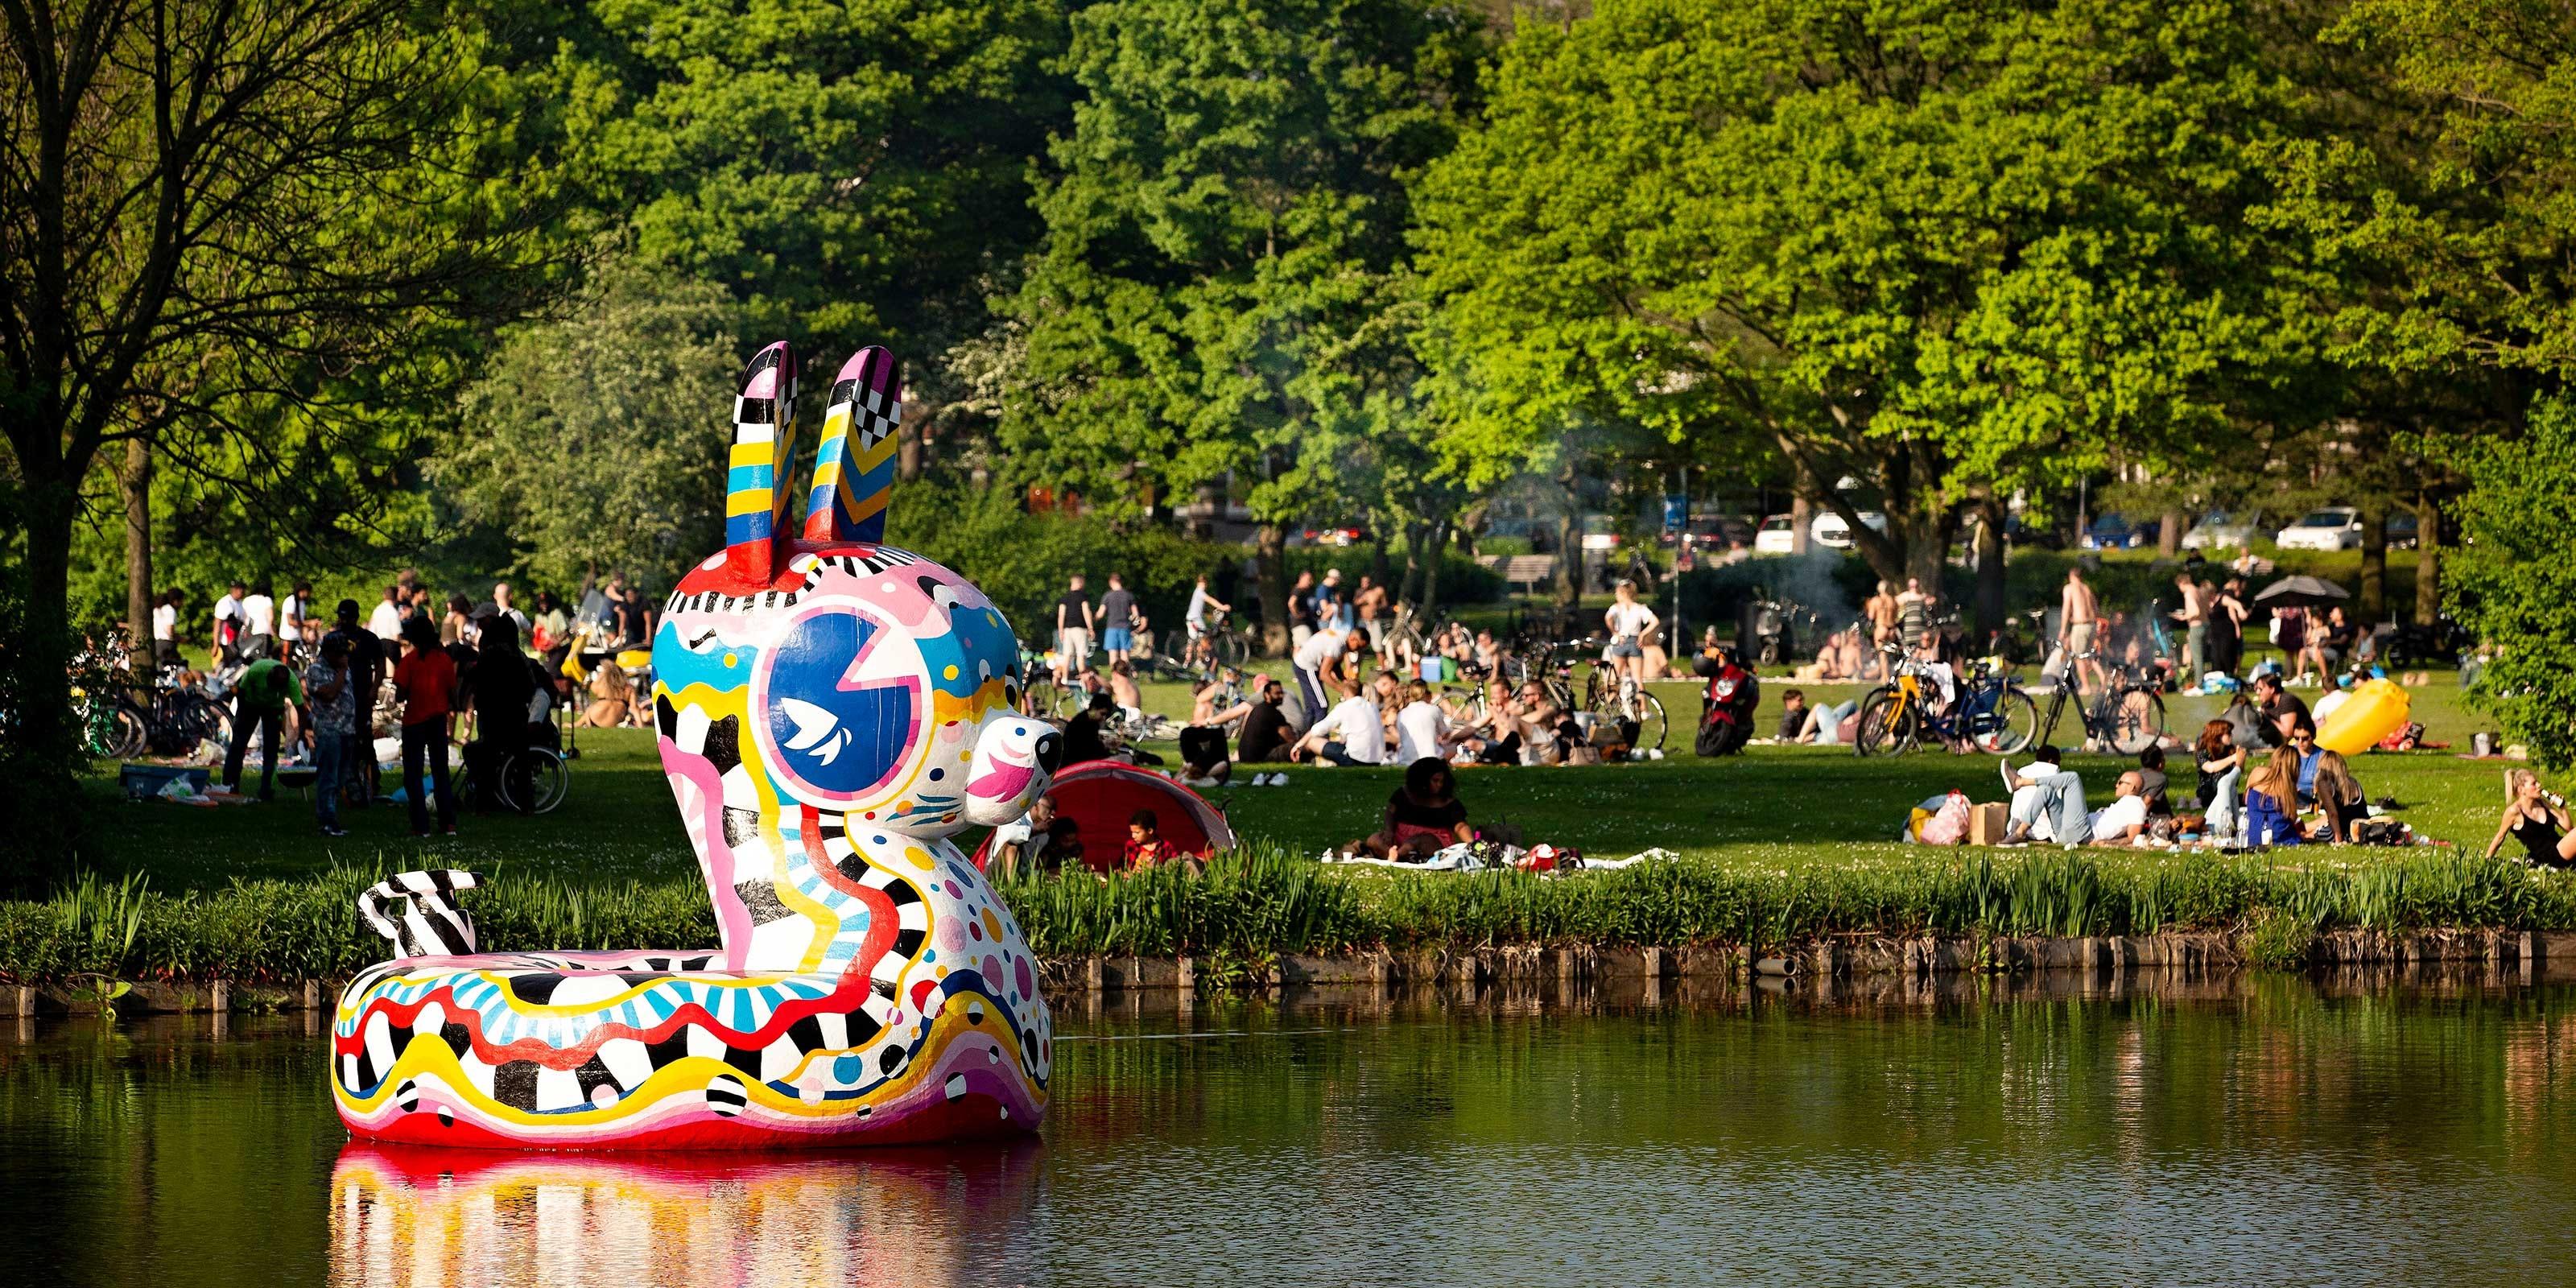 Hasil gambar untuk summer in rotterdam